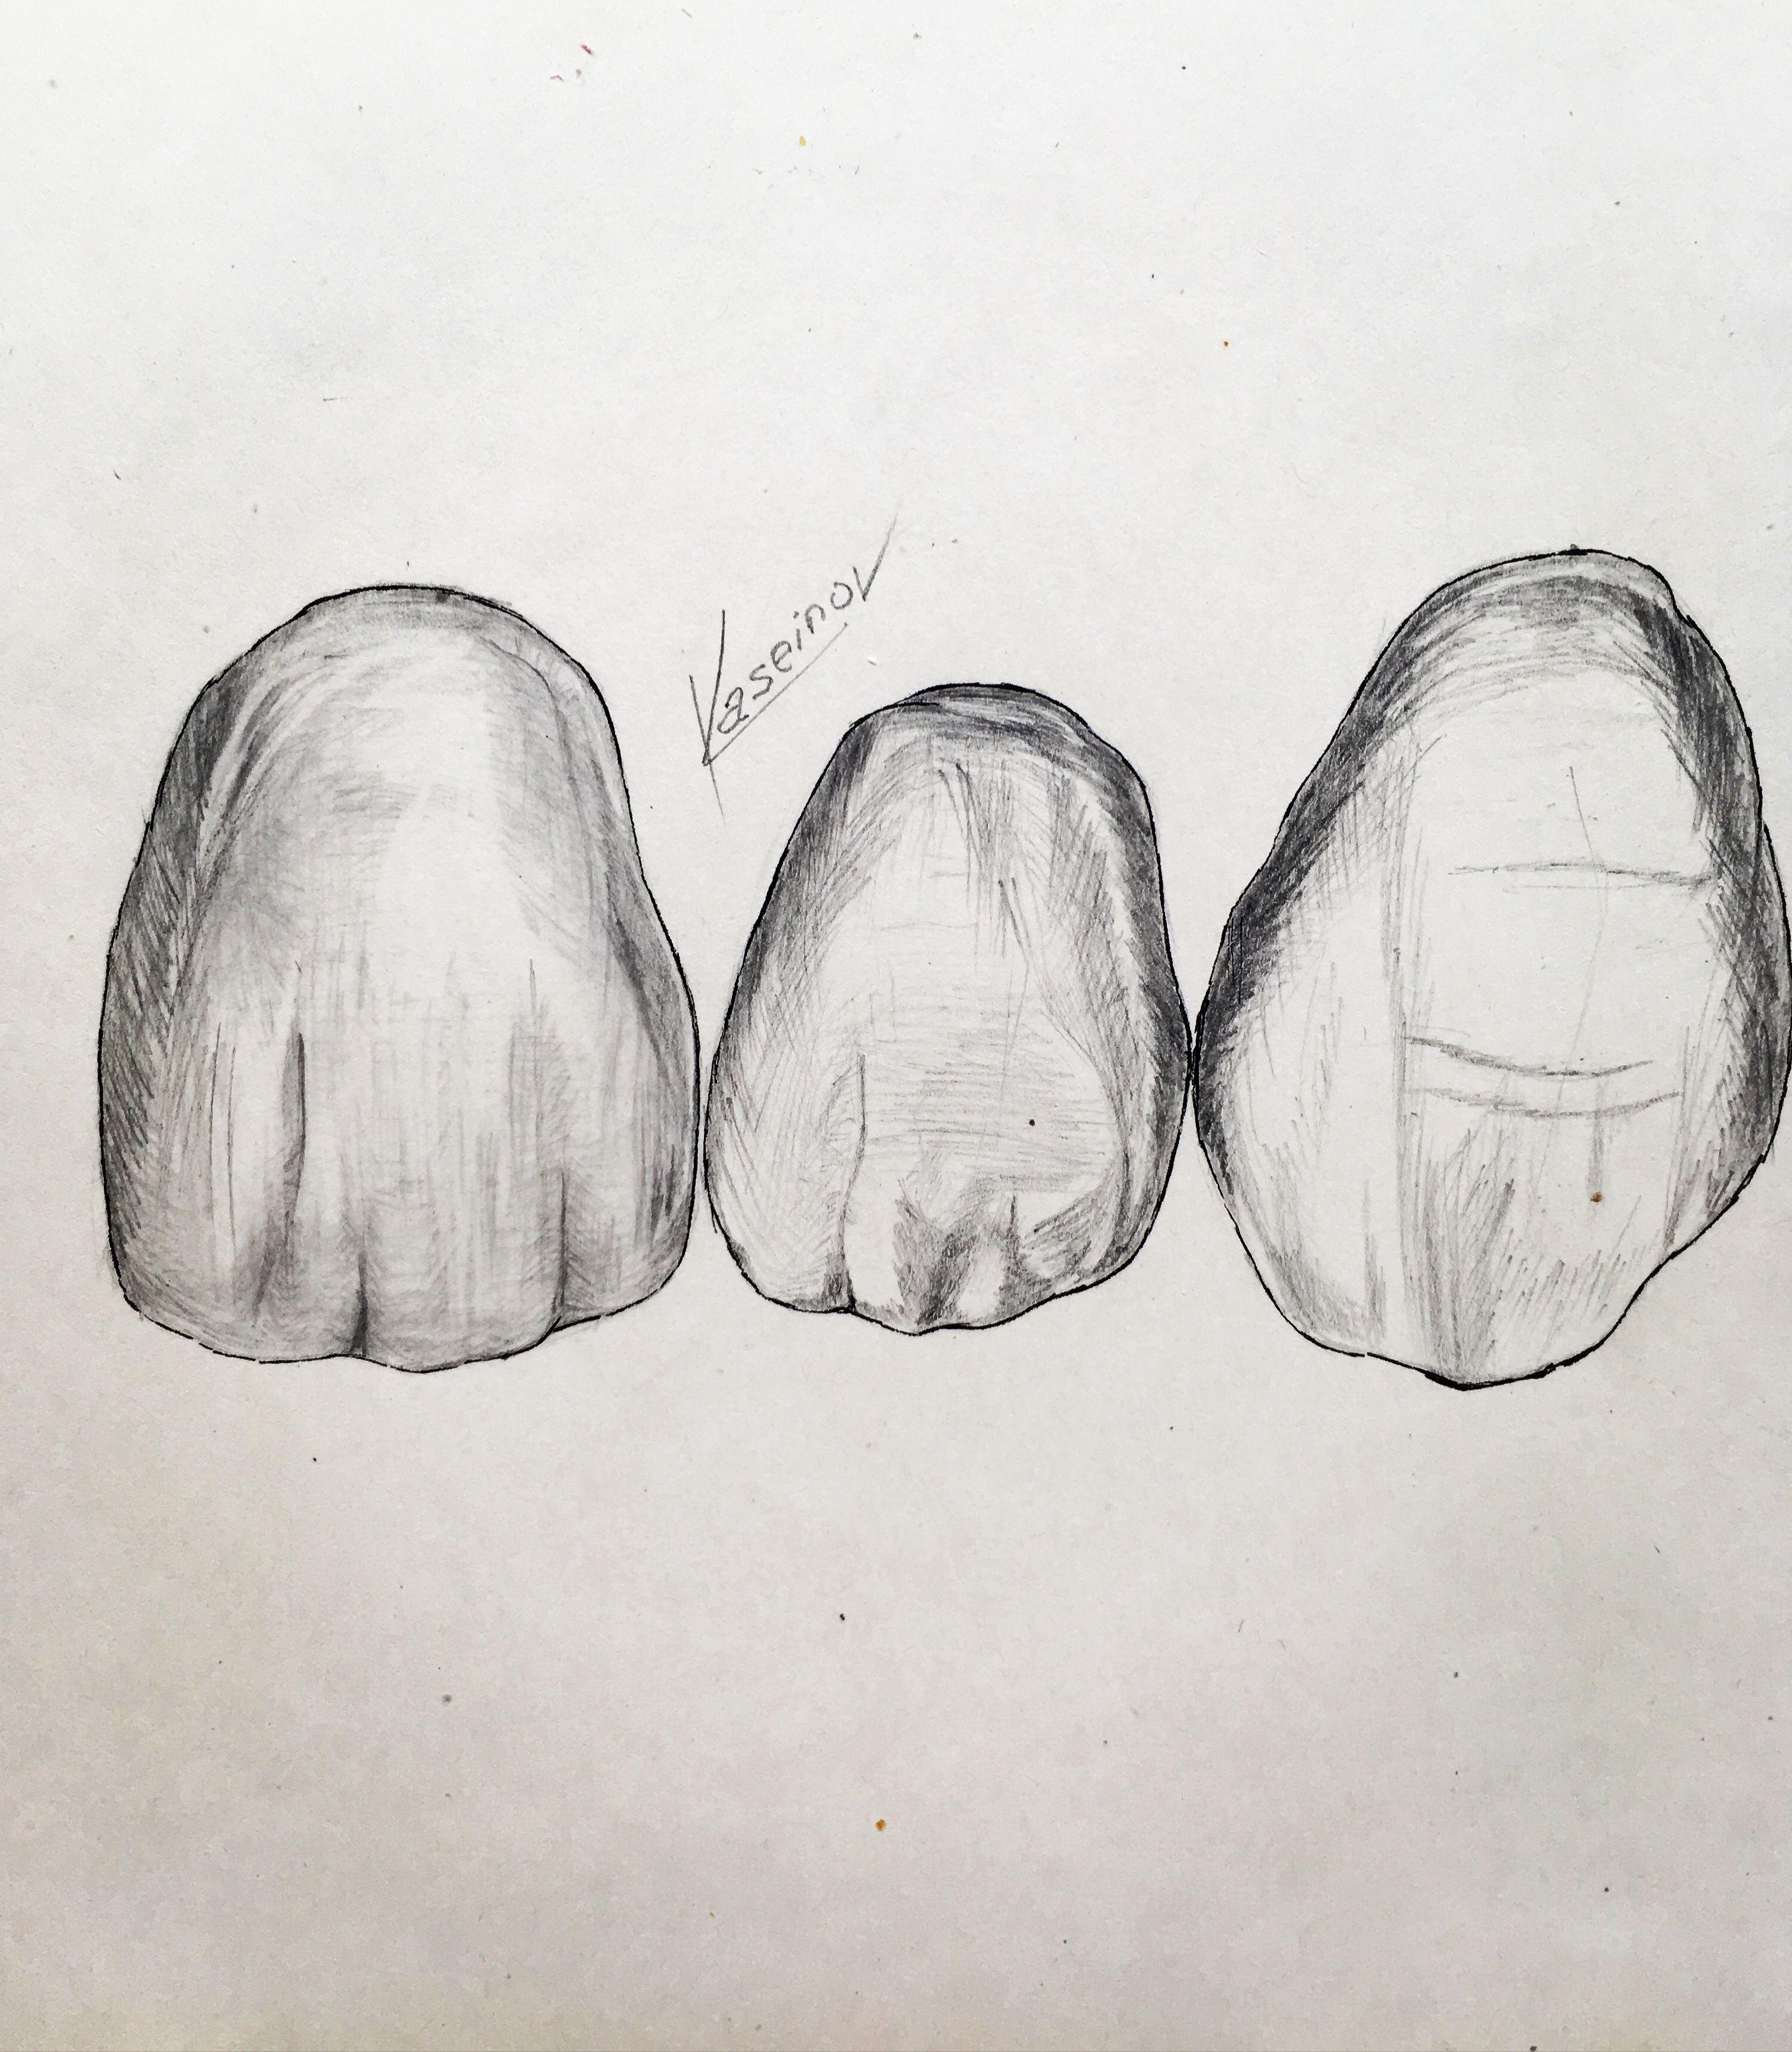 Pin De Danny Barro En Odontologia Arte Dental Anatomia Dental Diente Dibujo